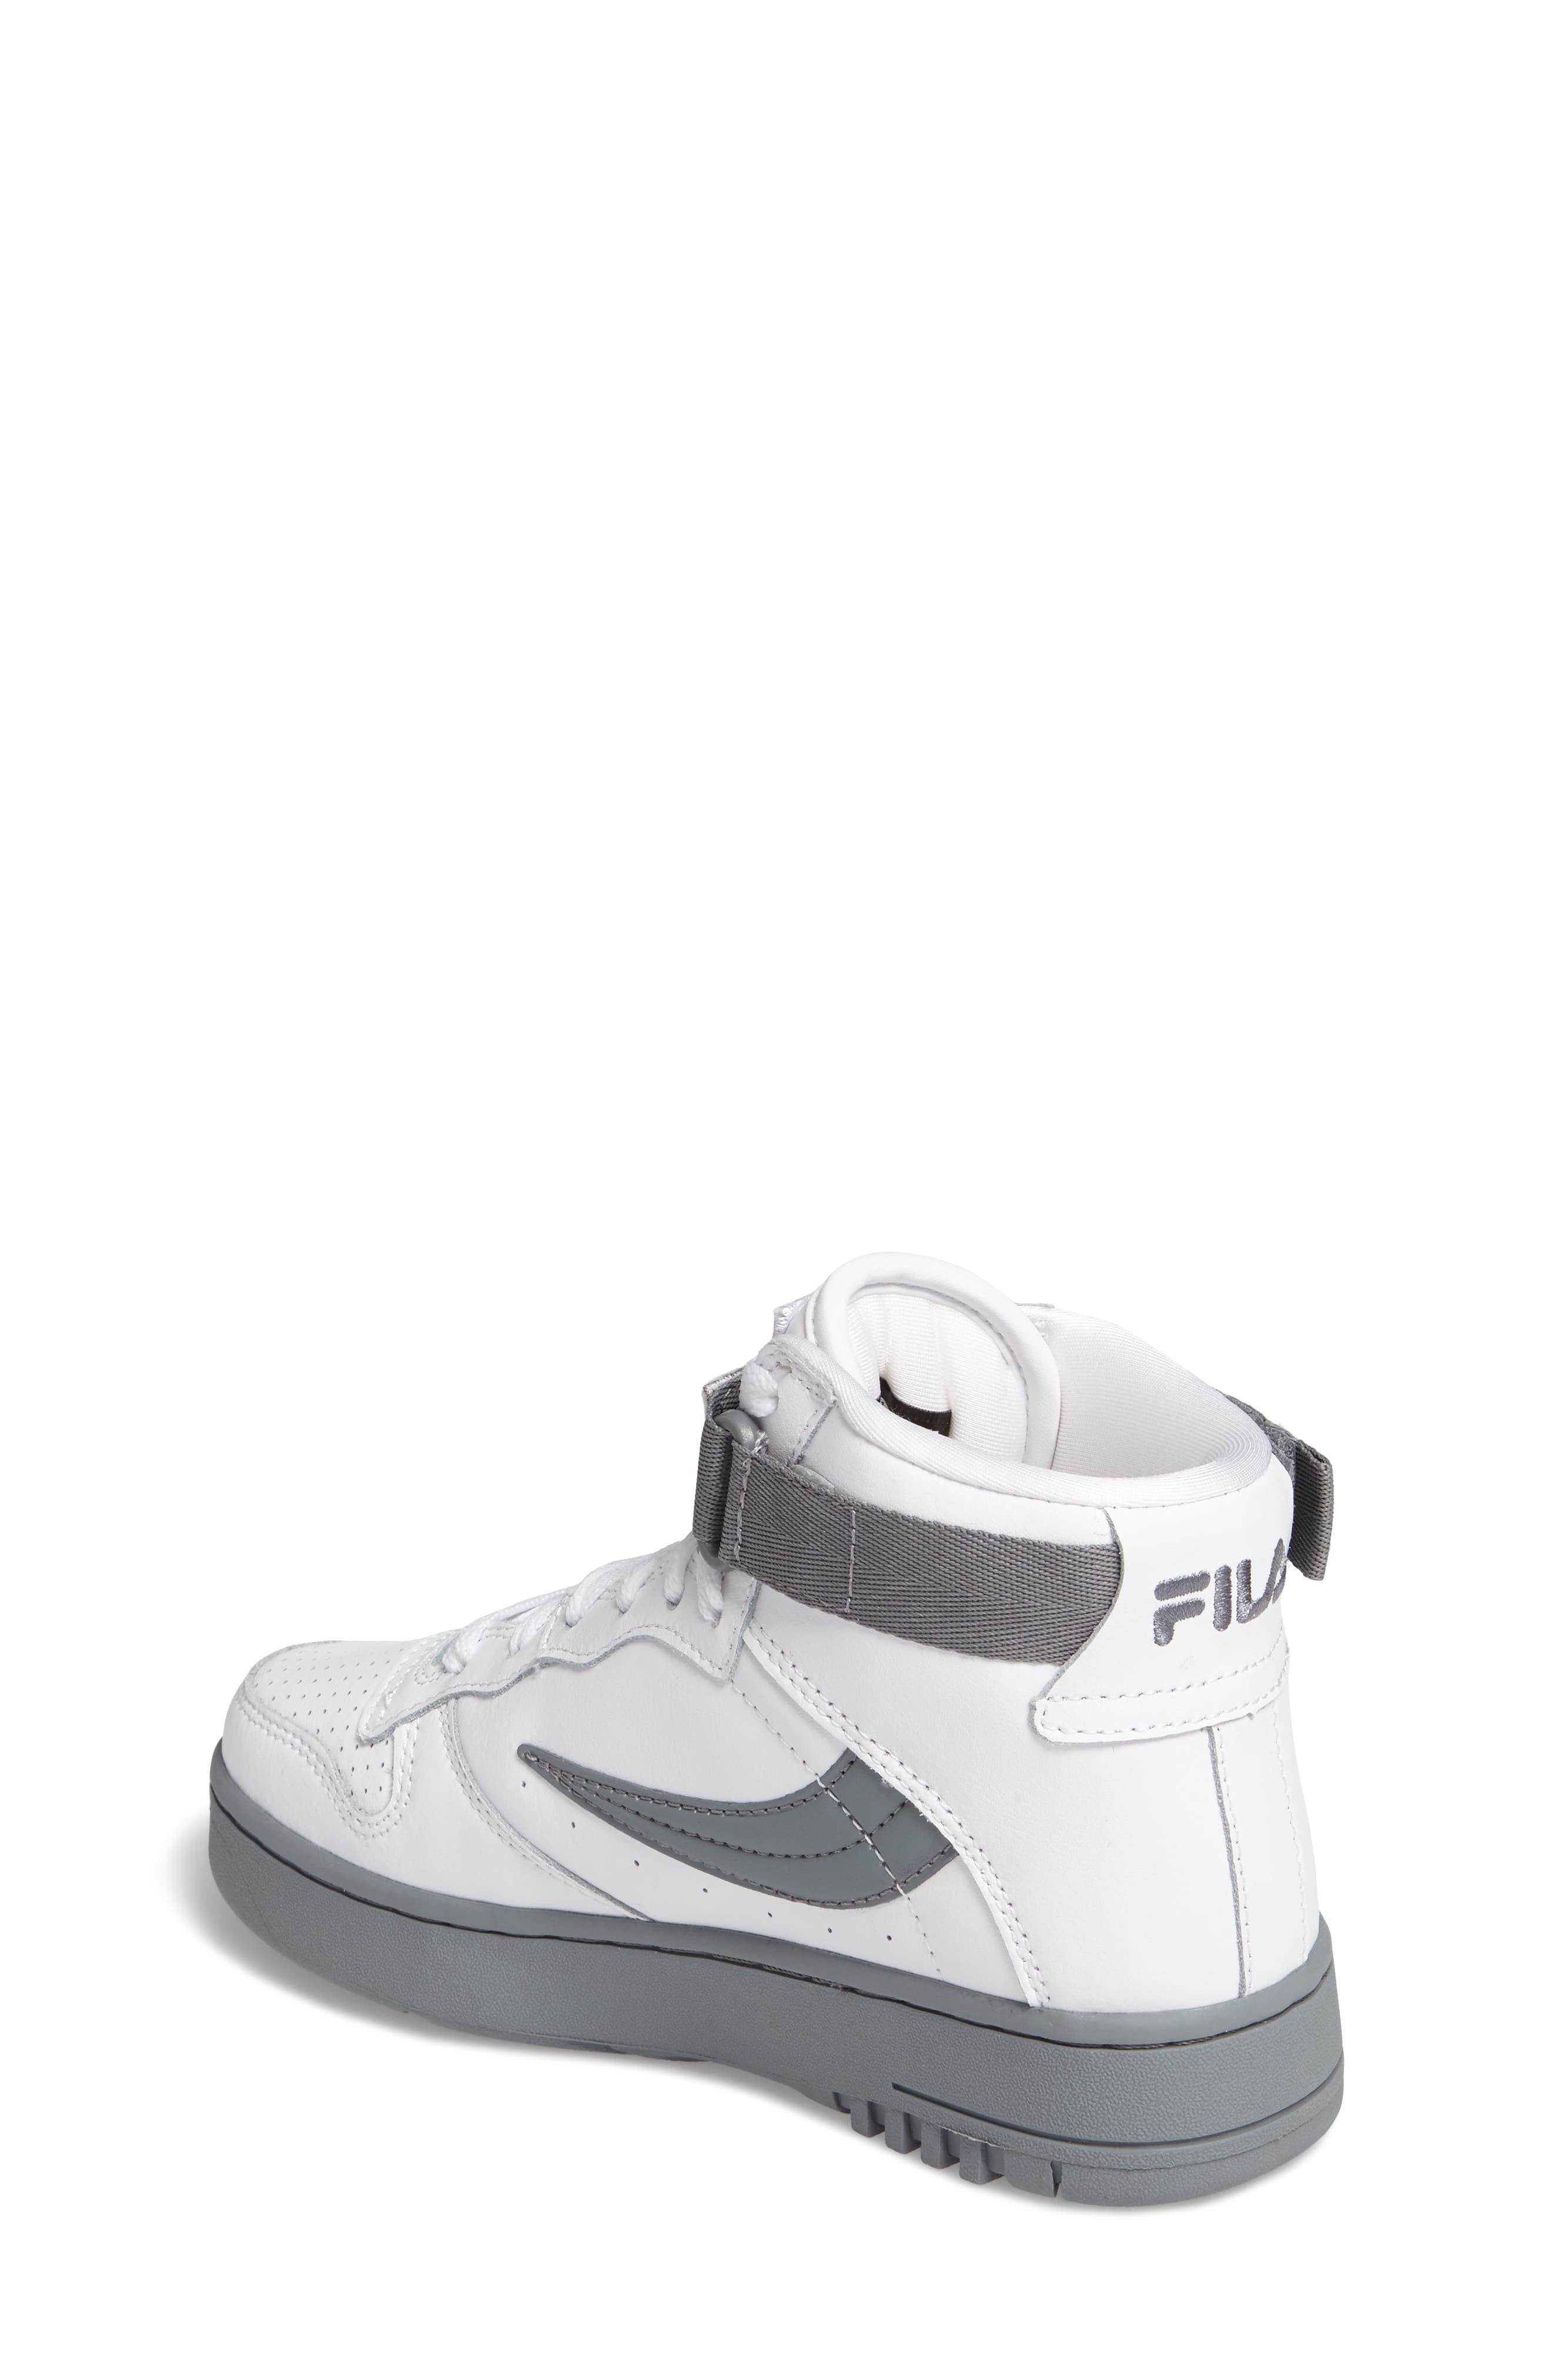 Alternate Image 2  - FILA FX-100 High Top Sneaker (Big Kid)